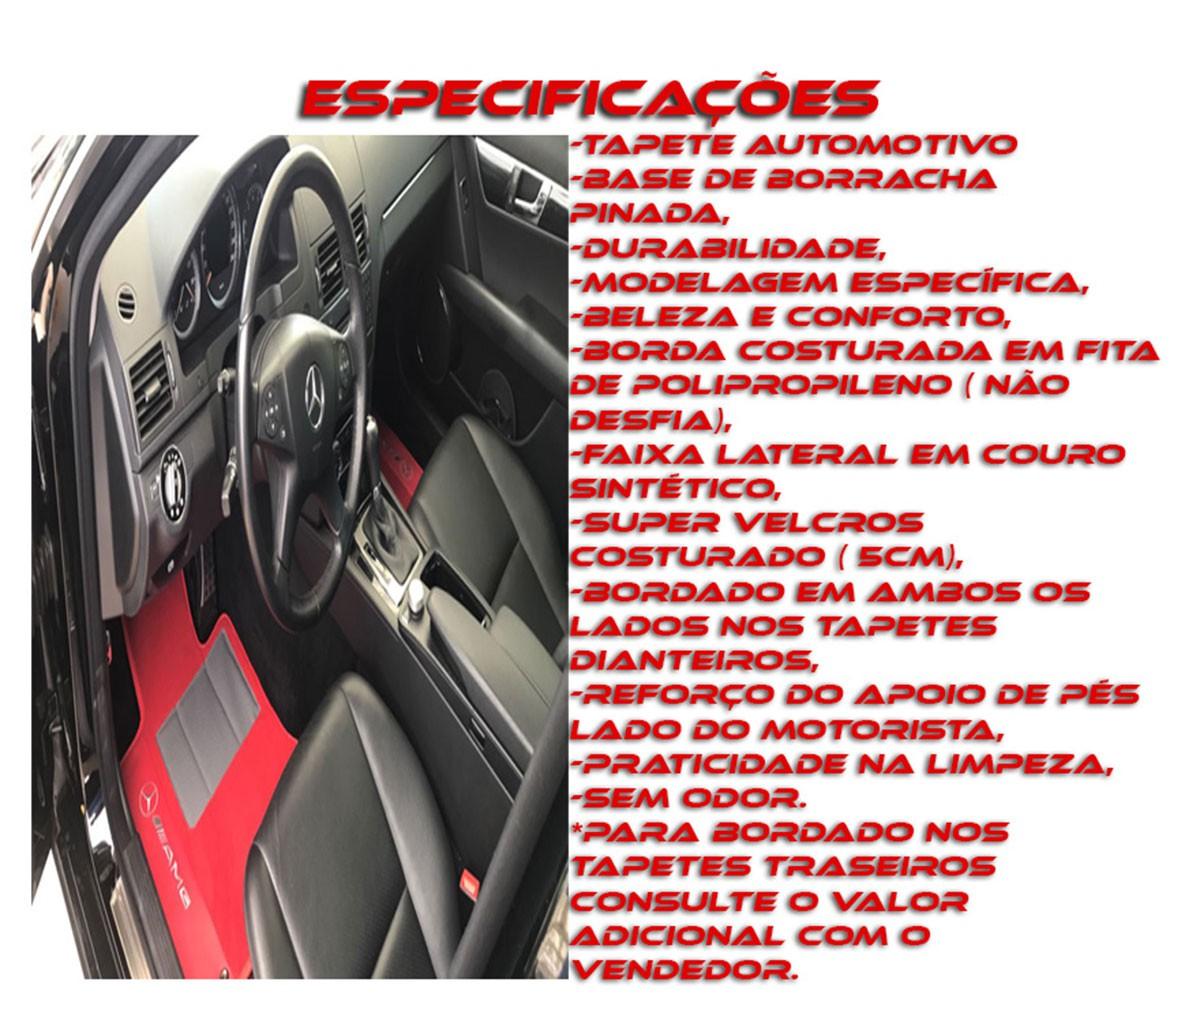 Porta Malas Nissan March Borracha Pvc Base Pinada